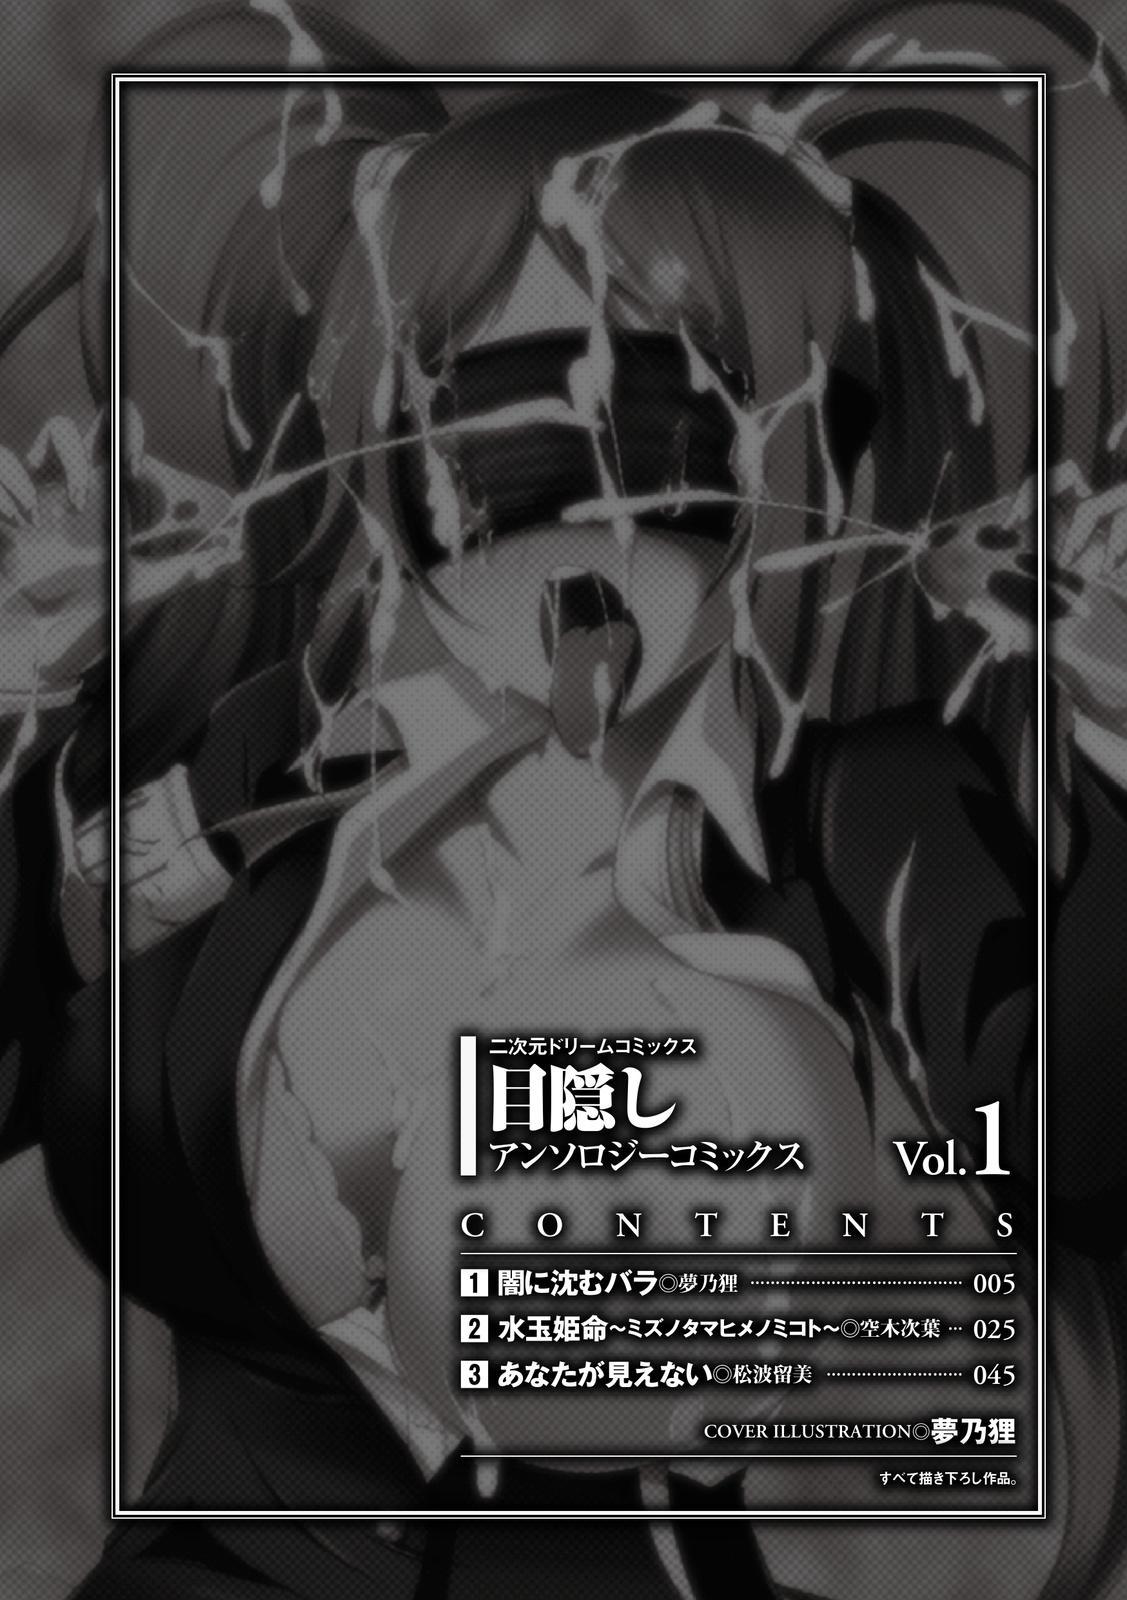 Mekakushi Anthology Comics Vol. 1 3